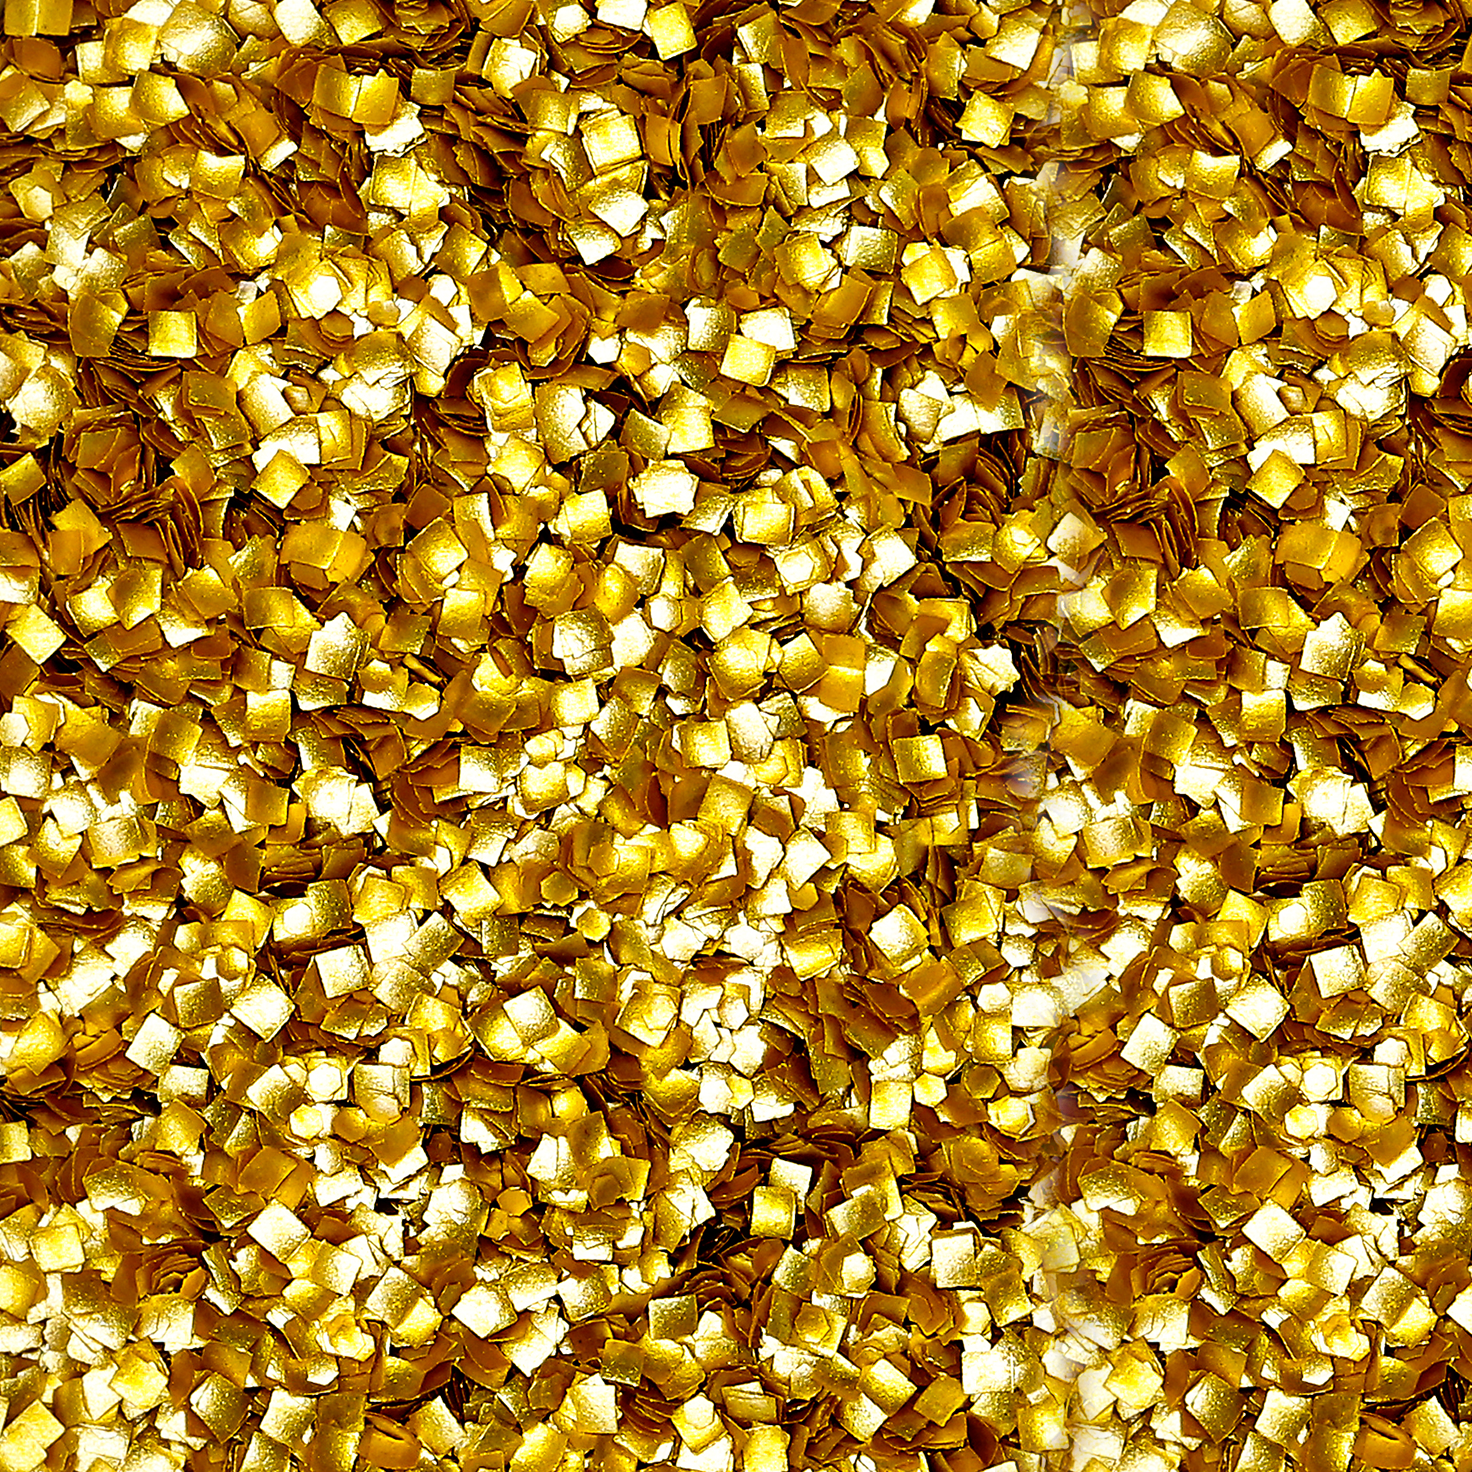 Free photo: Gold Glitter - Textured, Gold, Glittering ...